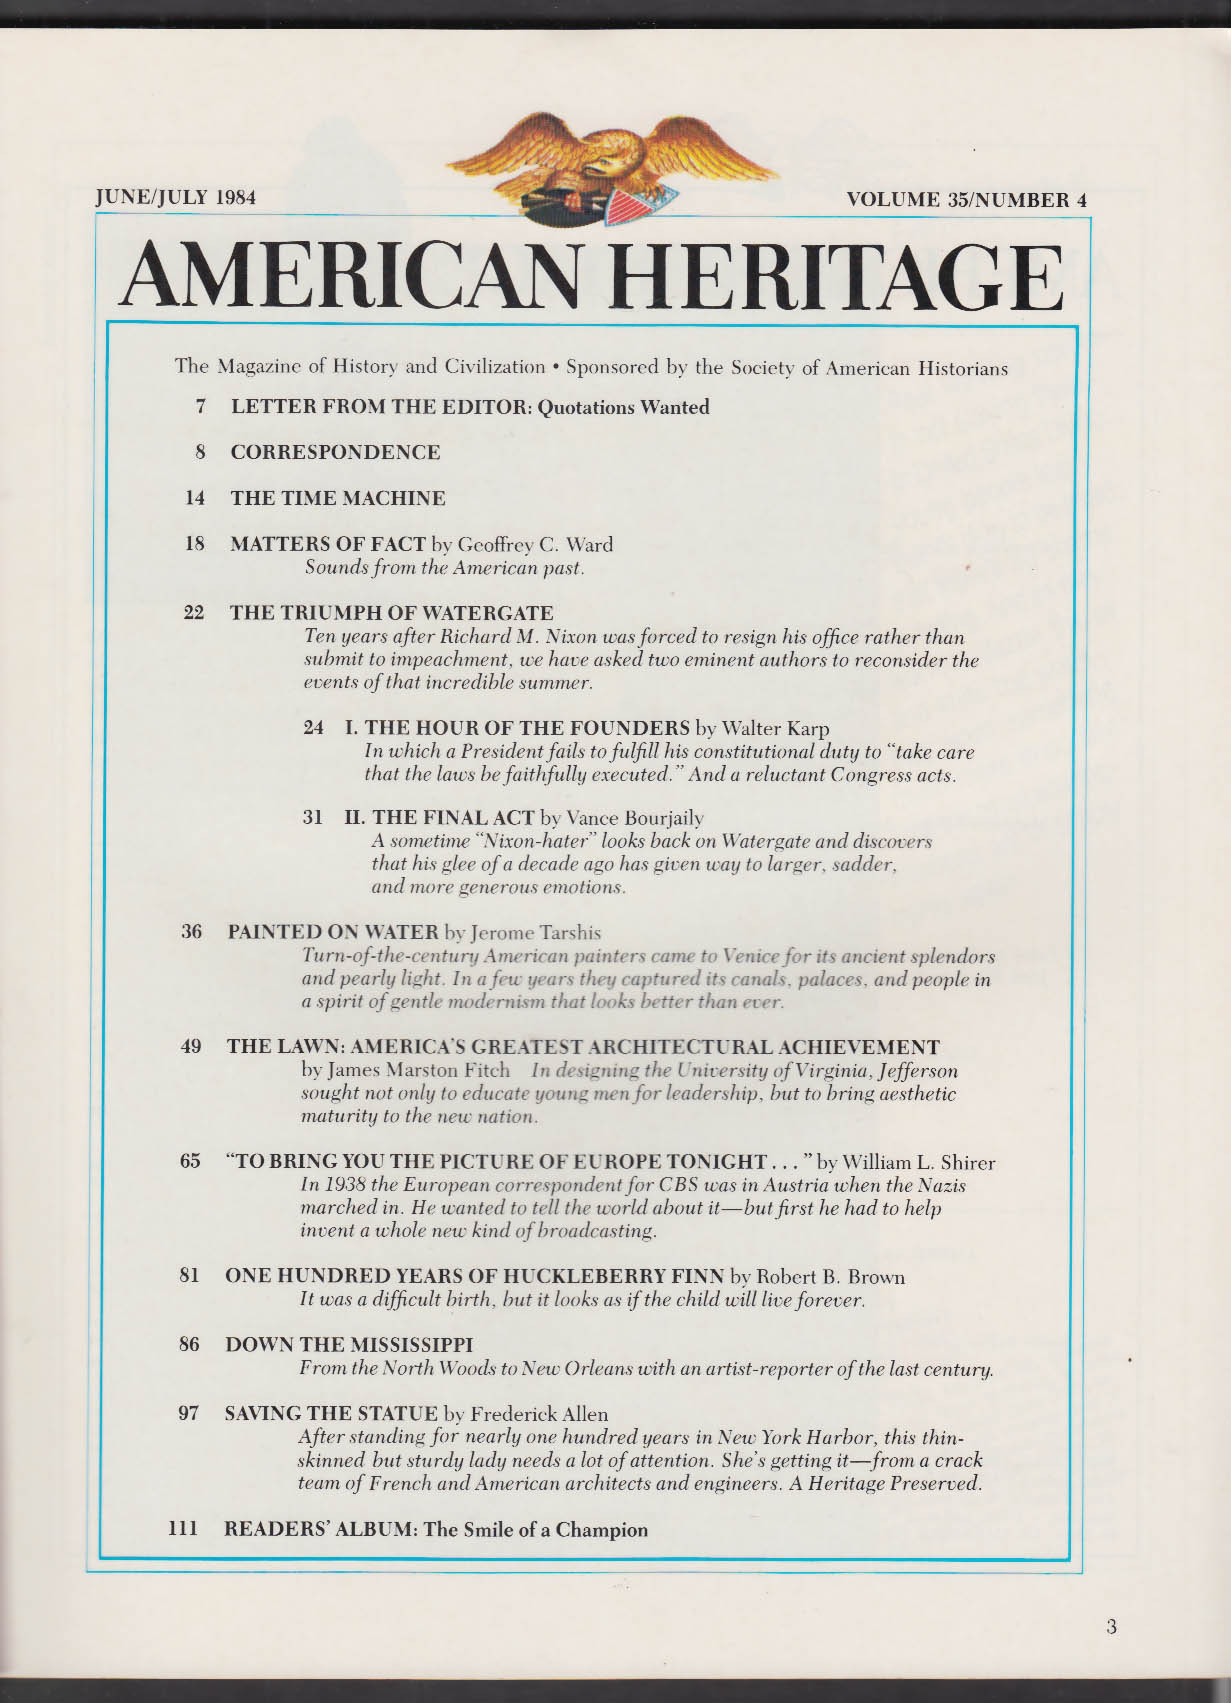 AMERICAN HERITAGE Watergate Nixon Huckleberry Finn + 6-7 1984